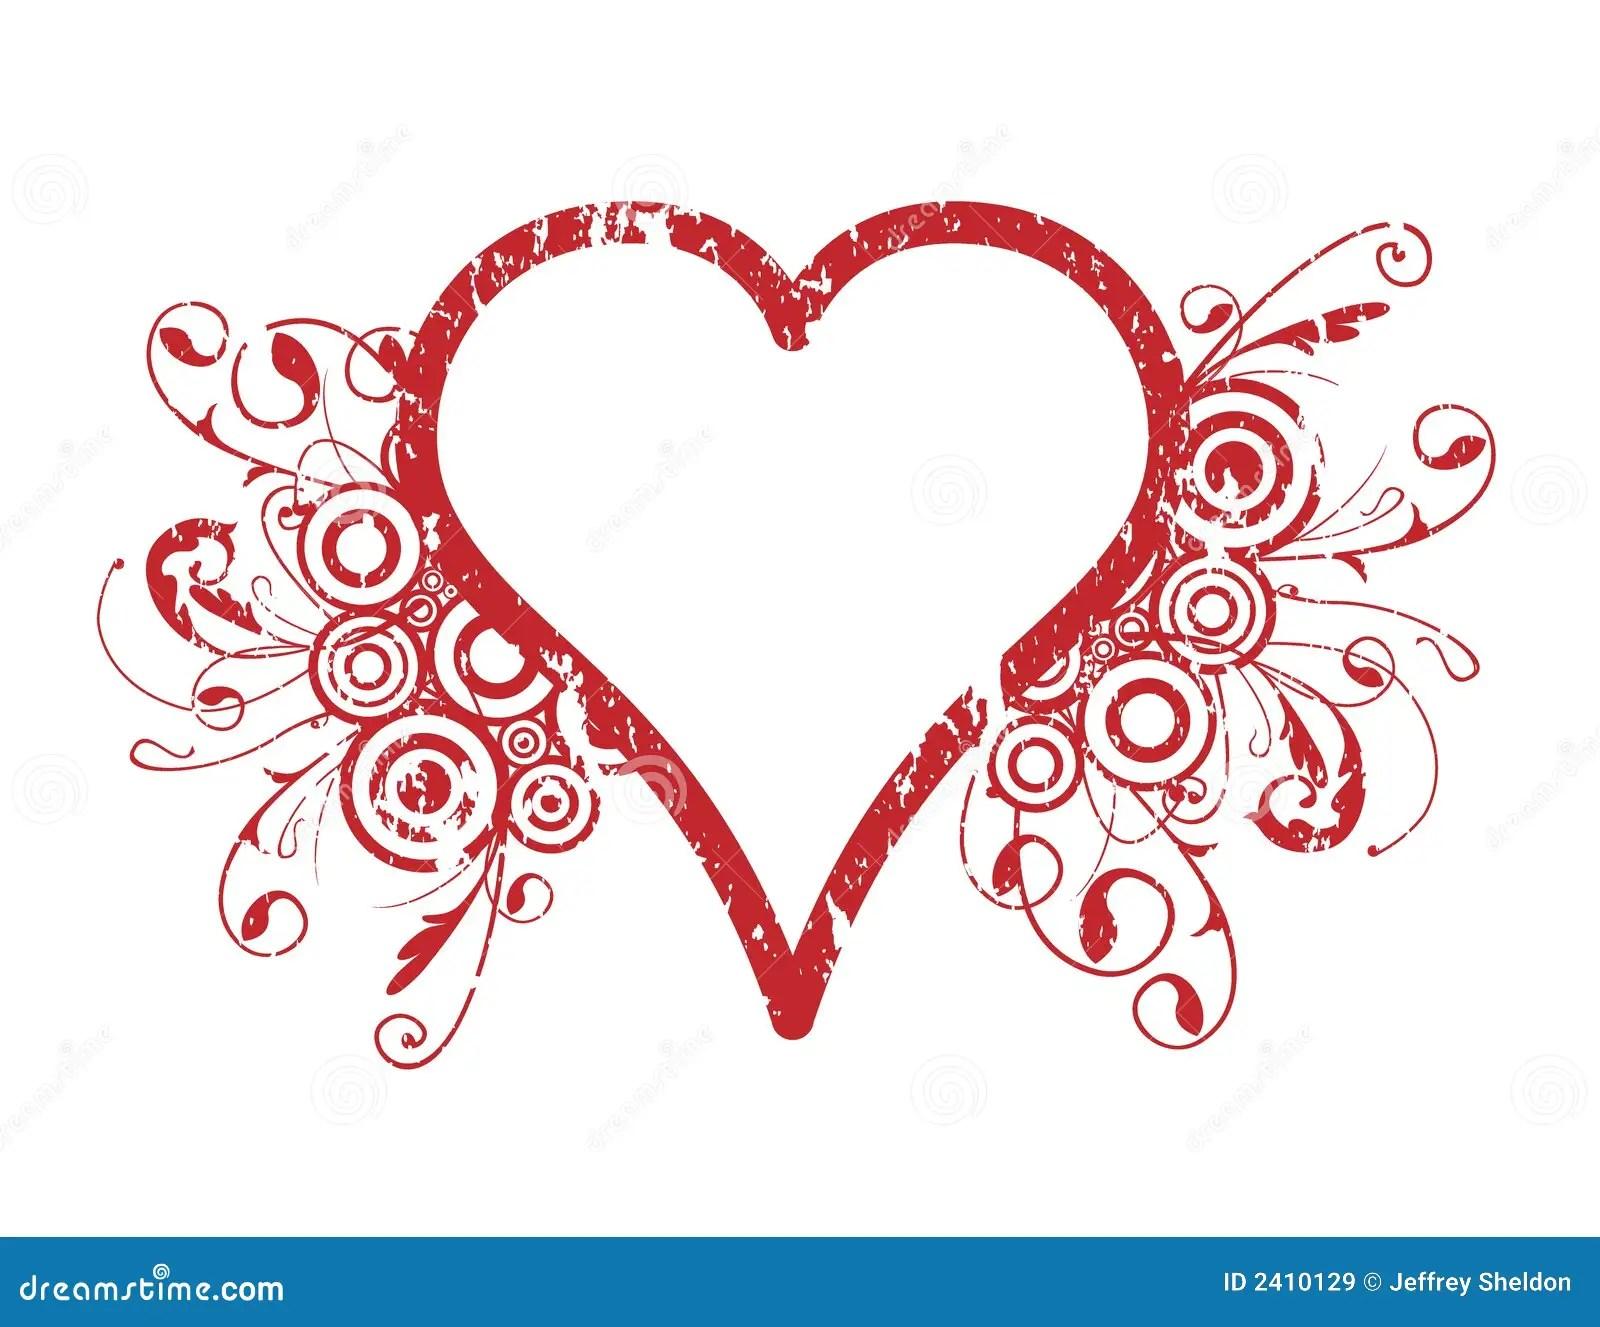 Heart Design Stock Vector Illustration Of Curving